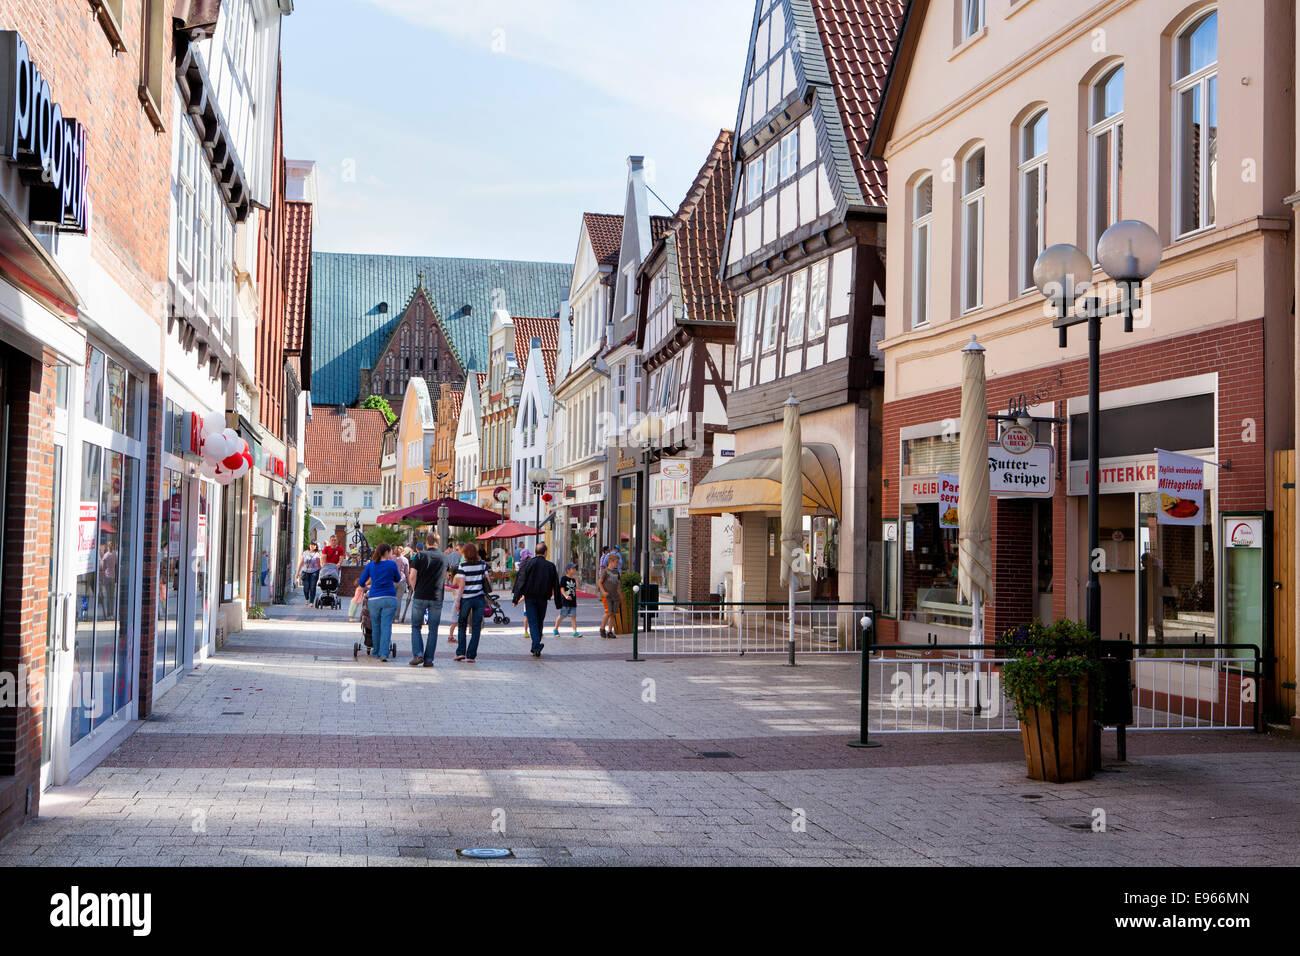 pedestrianised high street, Verden an der Aller, Lower Saxony, Germany, Europe, - Stock Image